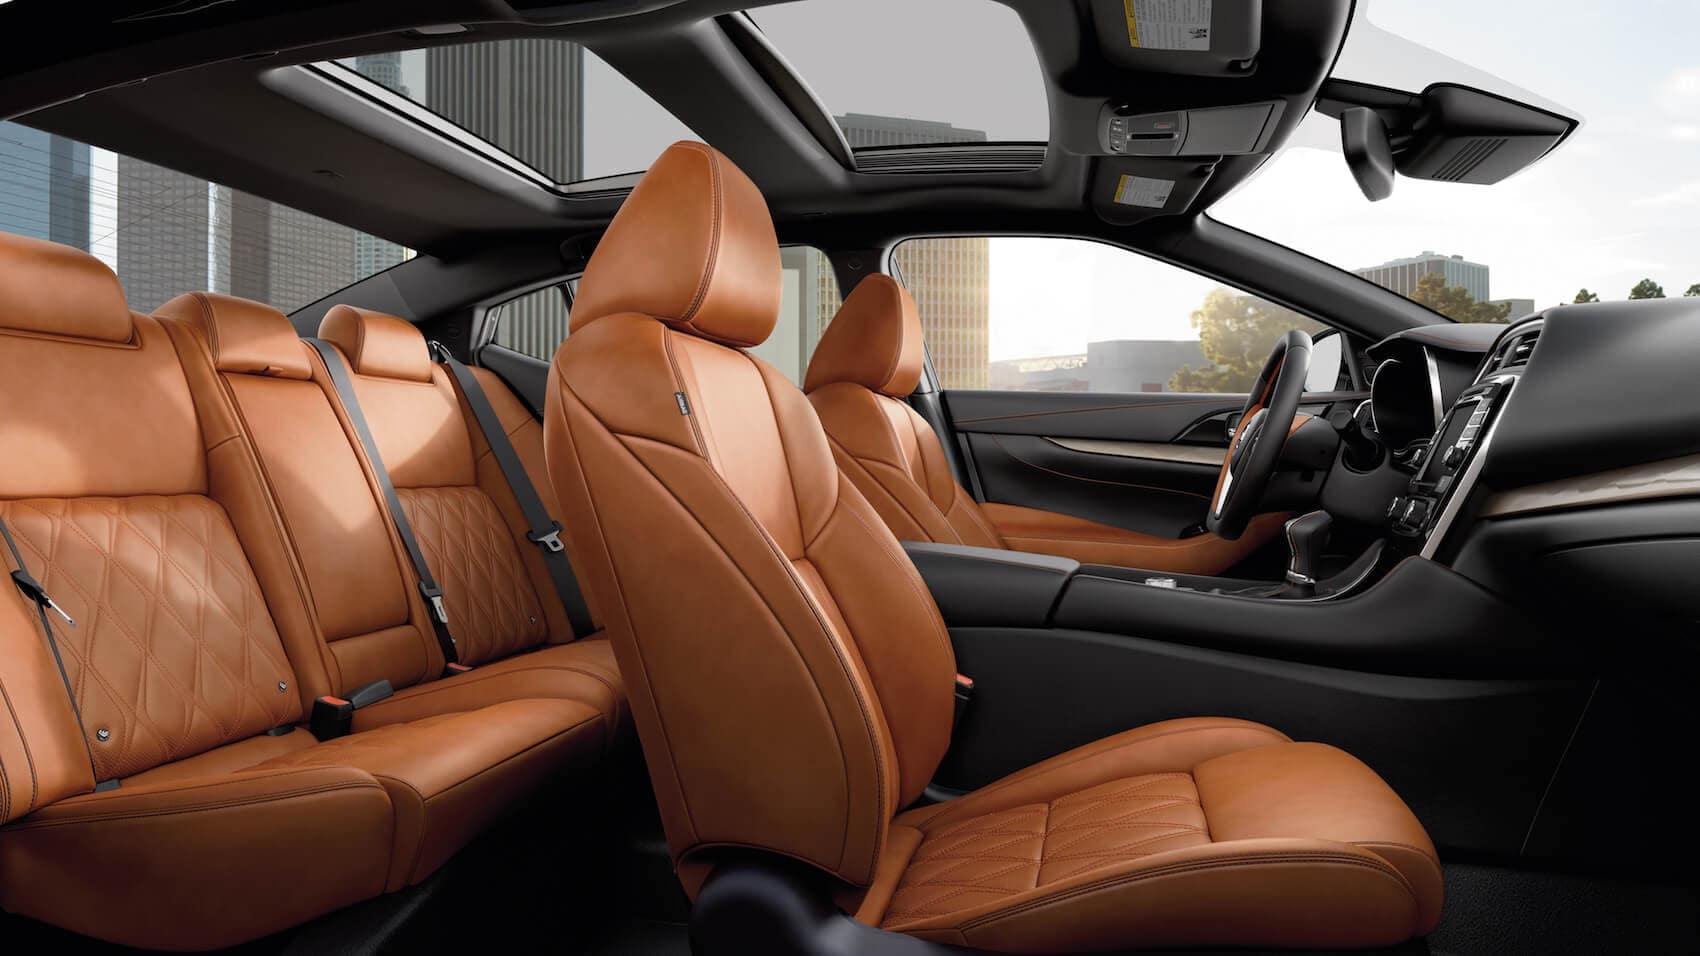 2020 Nissan Maxima interior Jenkintown, PA